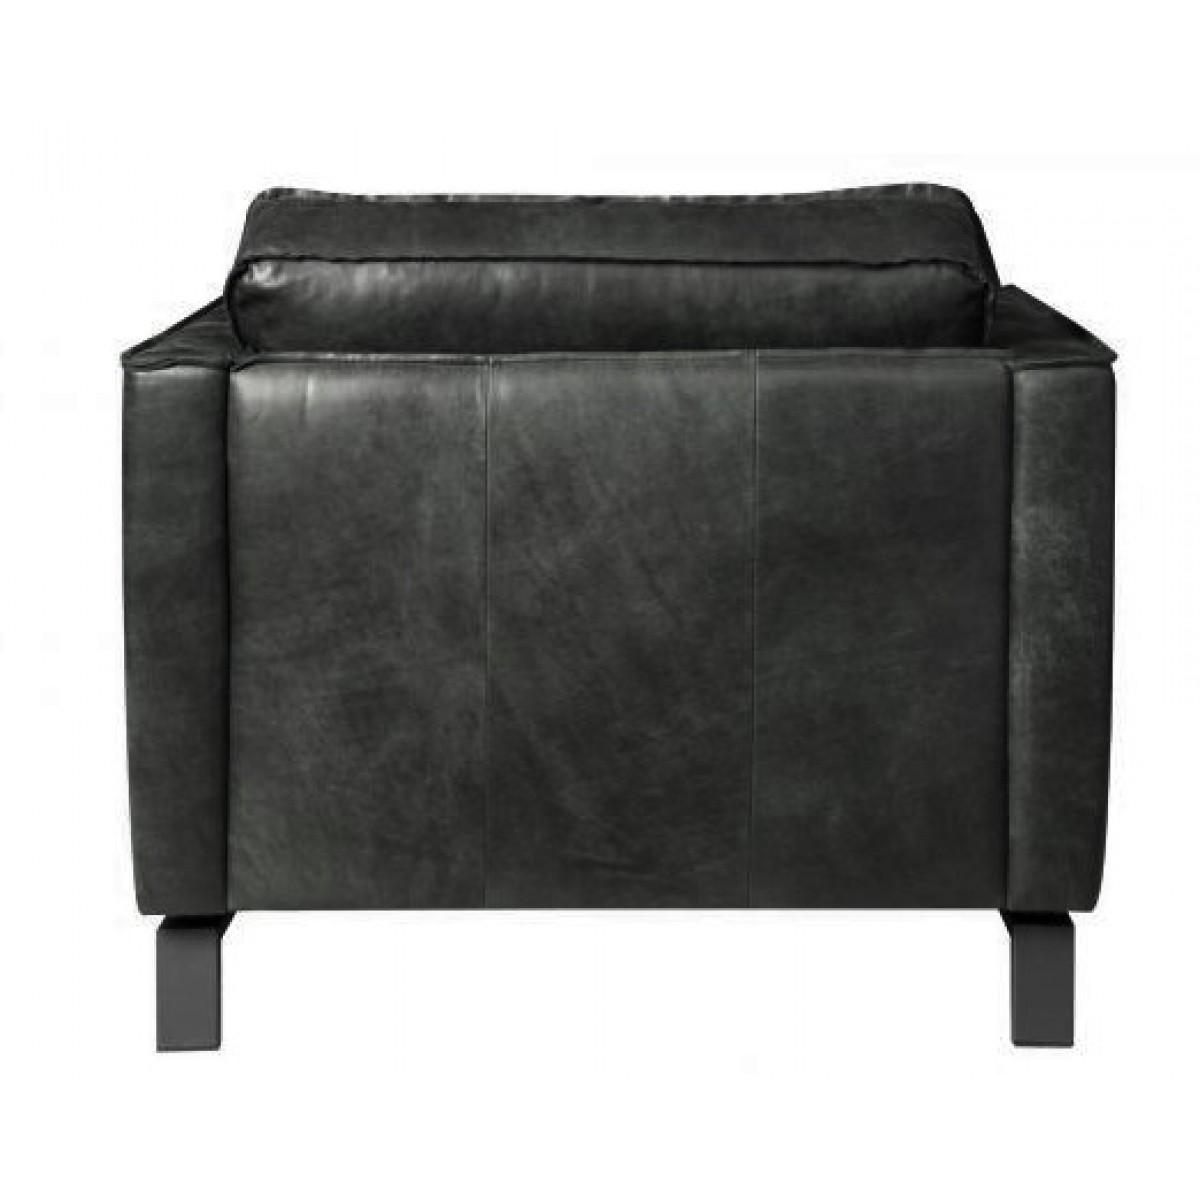 boris-fauteuil-loveseat-1zits-1,5zits-leder-walnut-achter